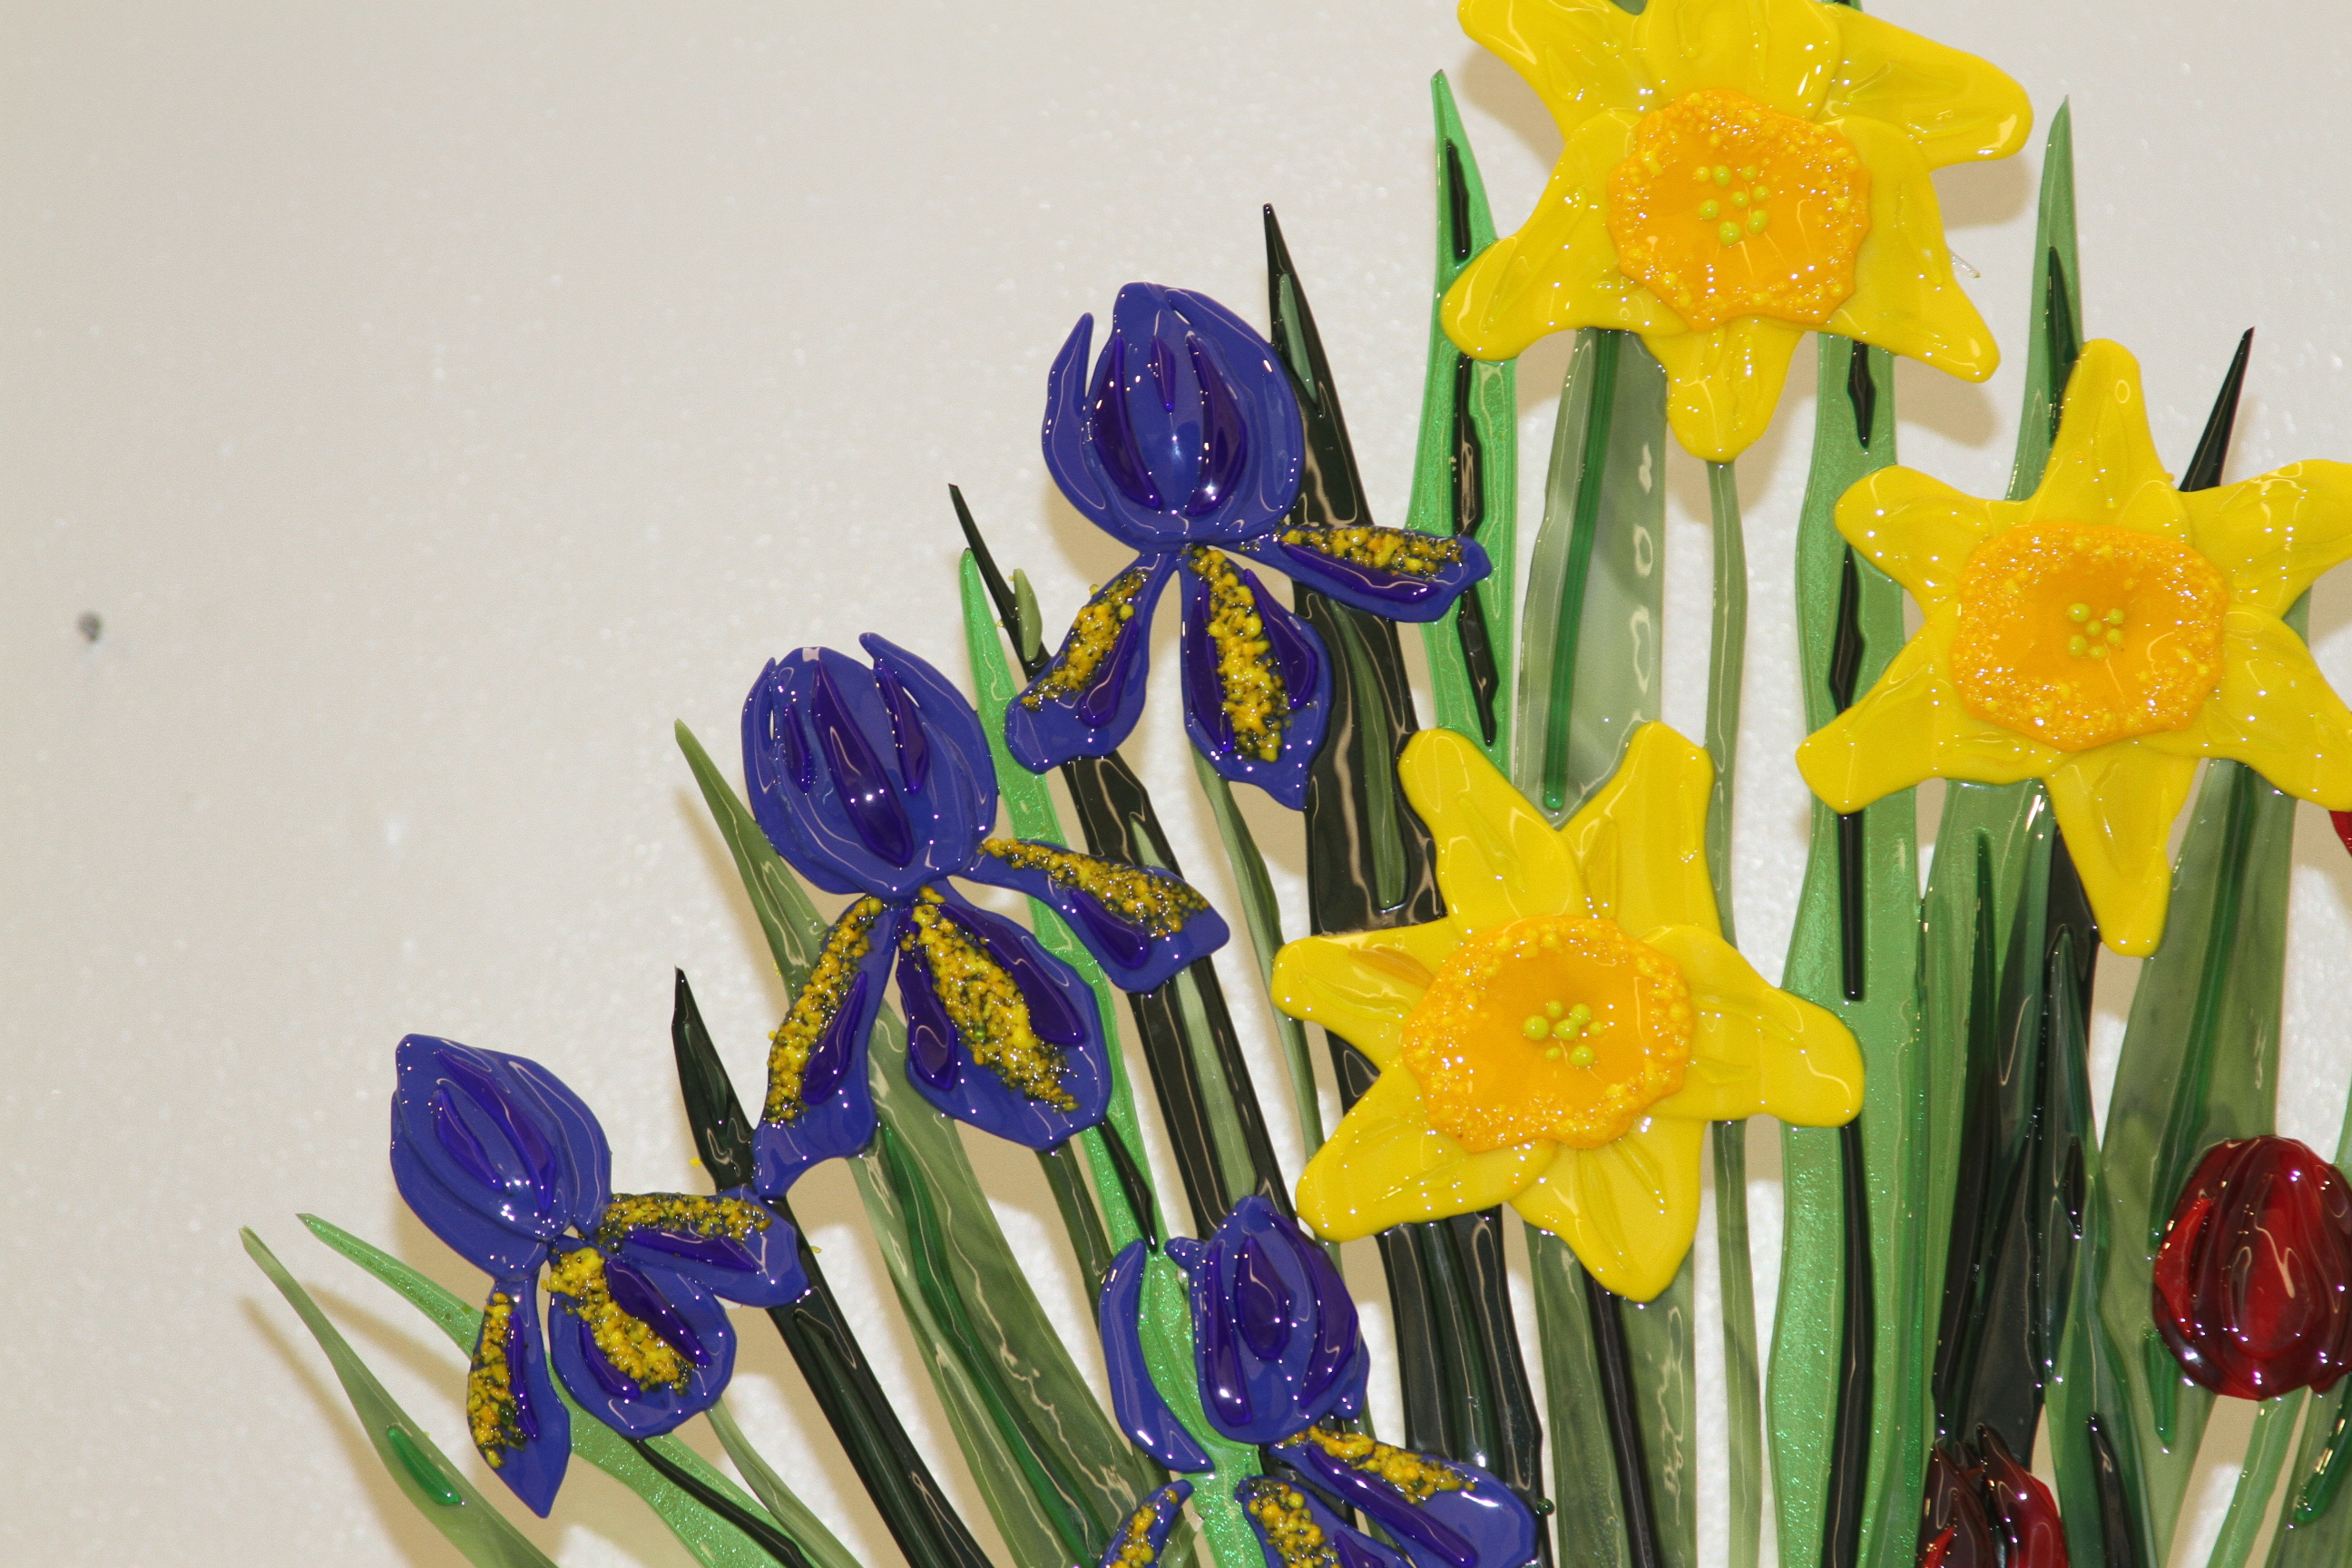 Primary Colored Daffodils, Tulips & Iris